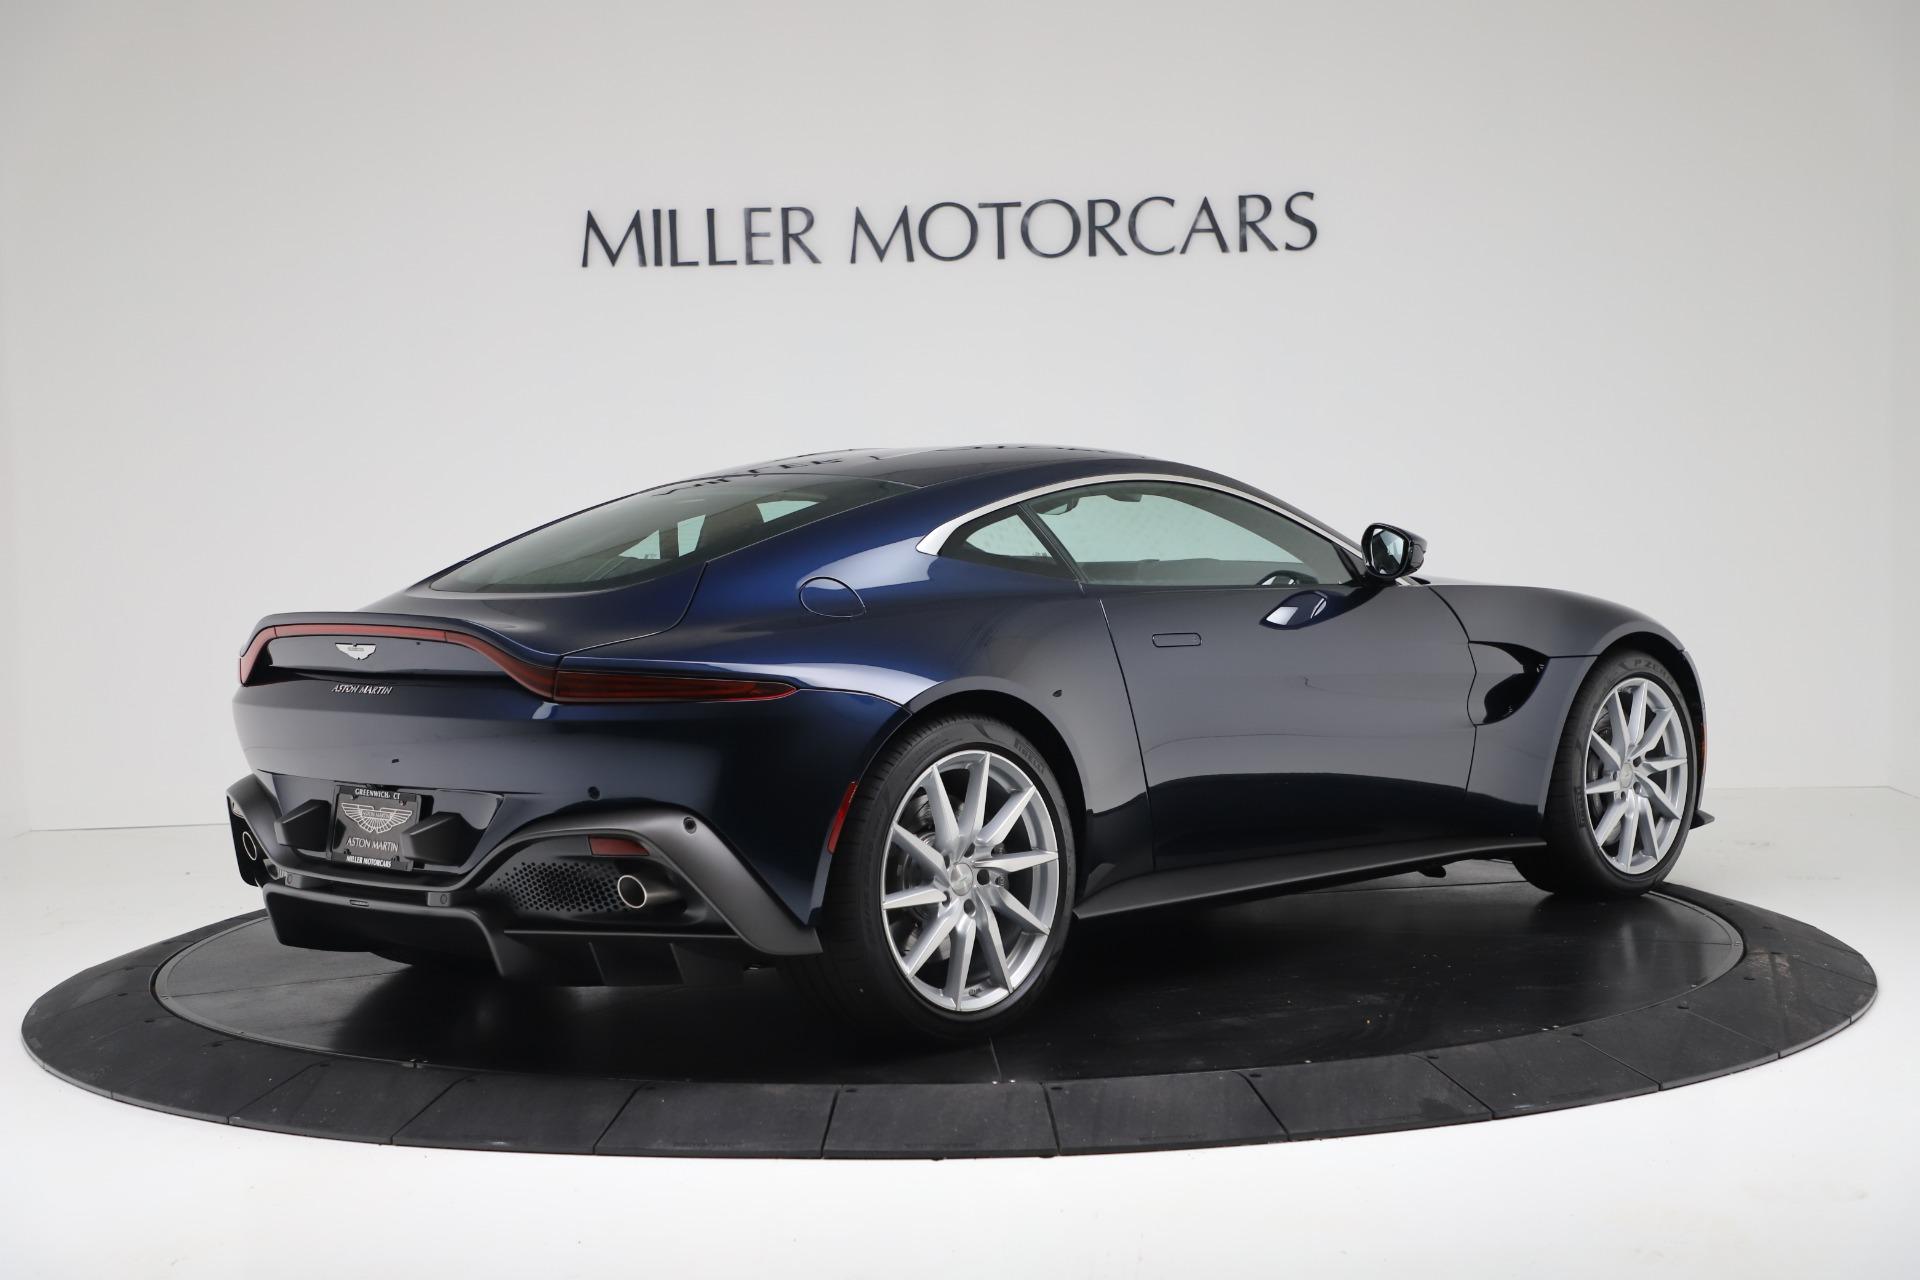 New 2020 Aston Martin Vantage V8 For Sale In Greenwich, CT 3369_p5